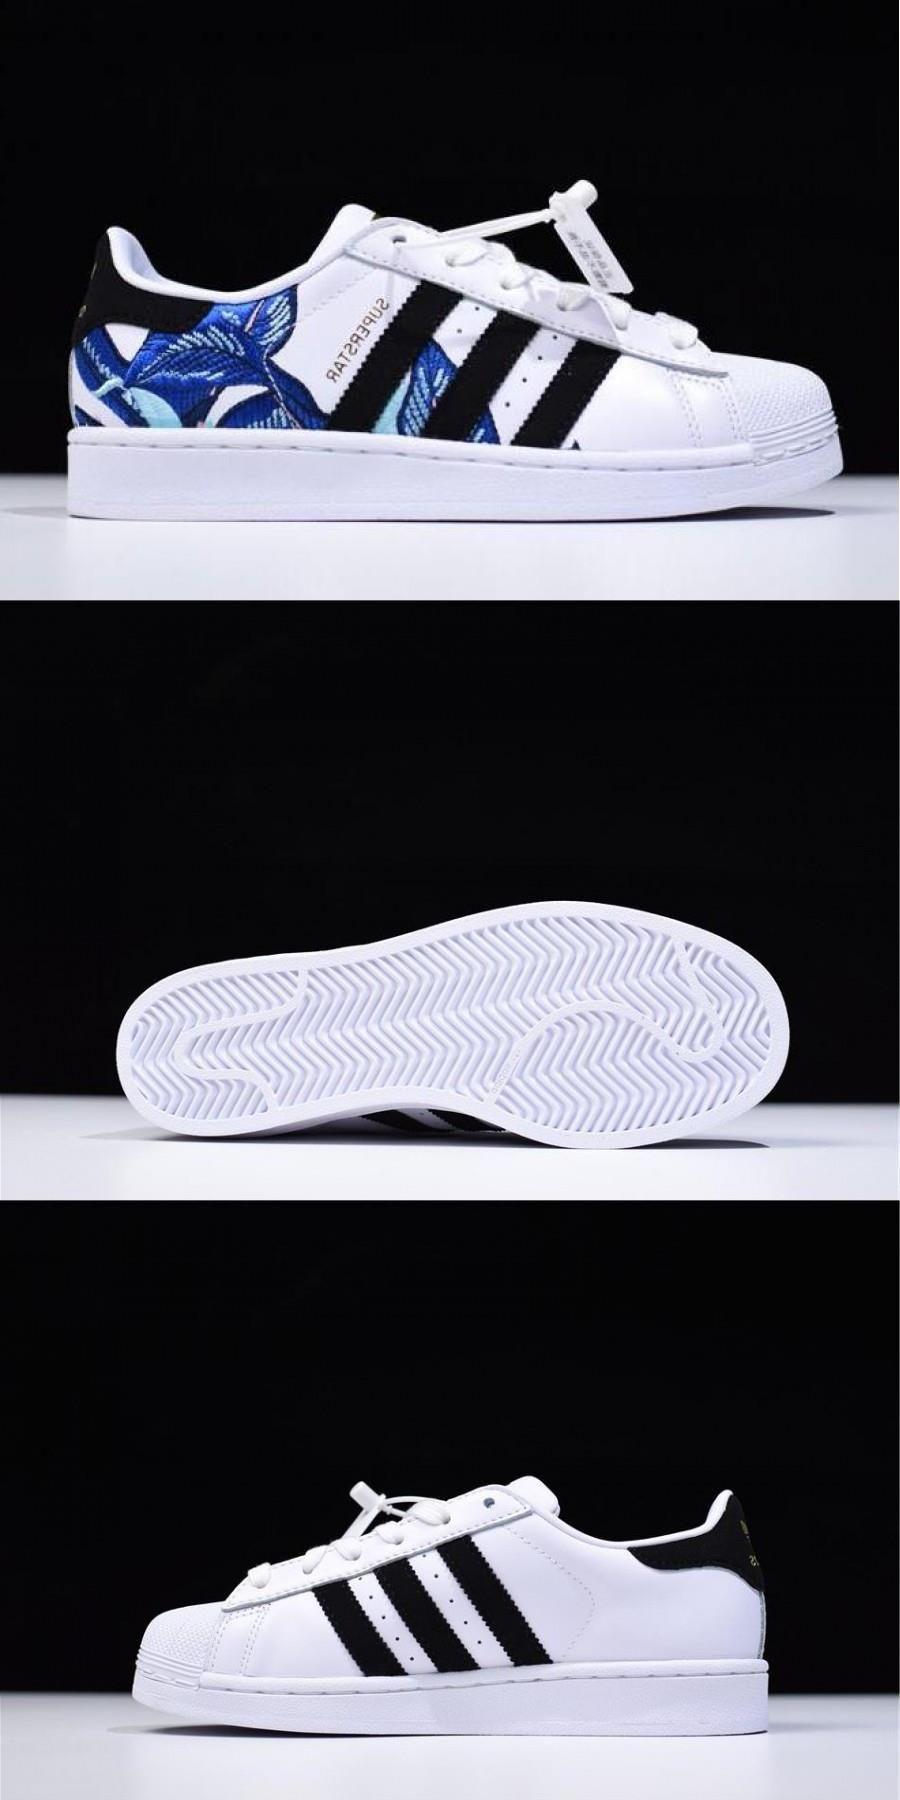 Adidas Superstar Floral Graphic White